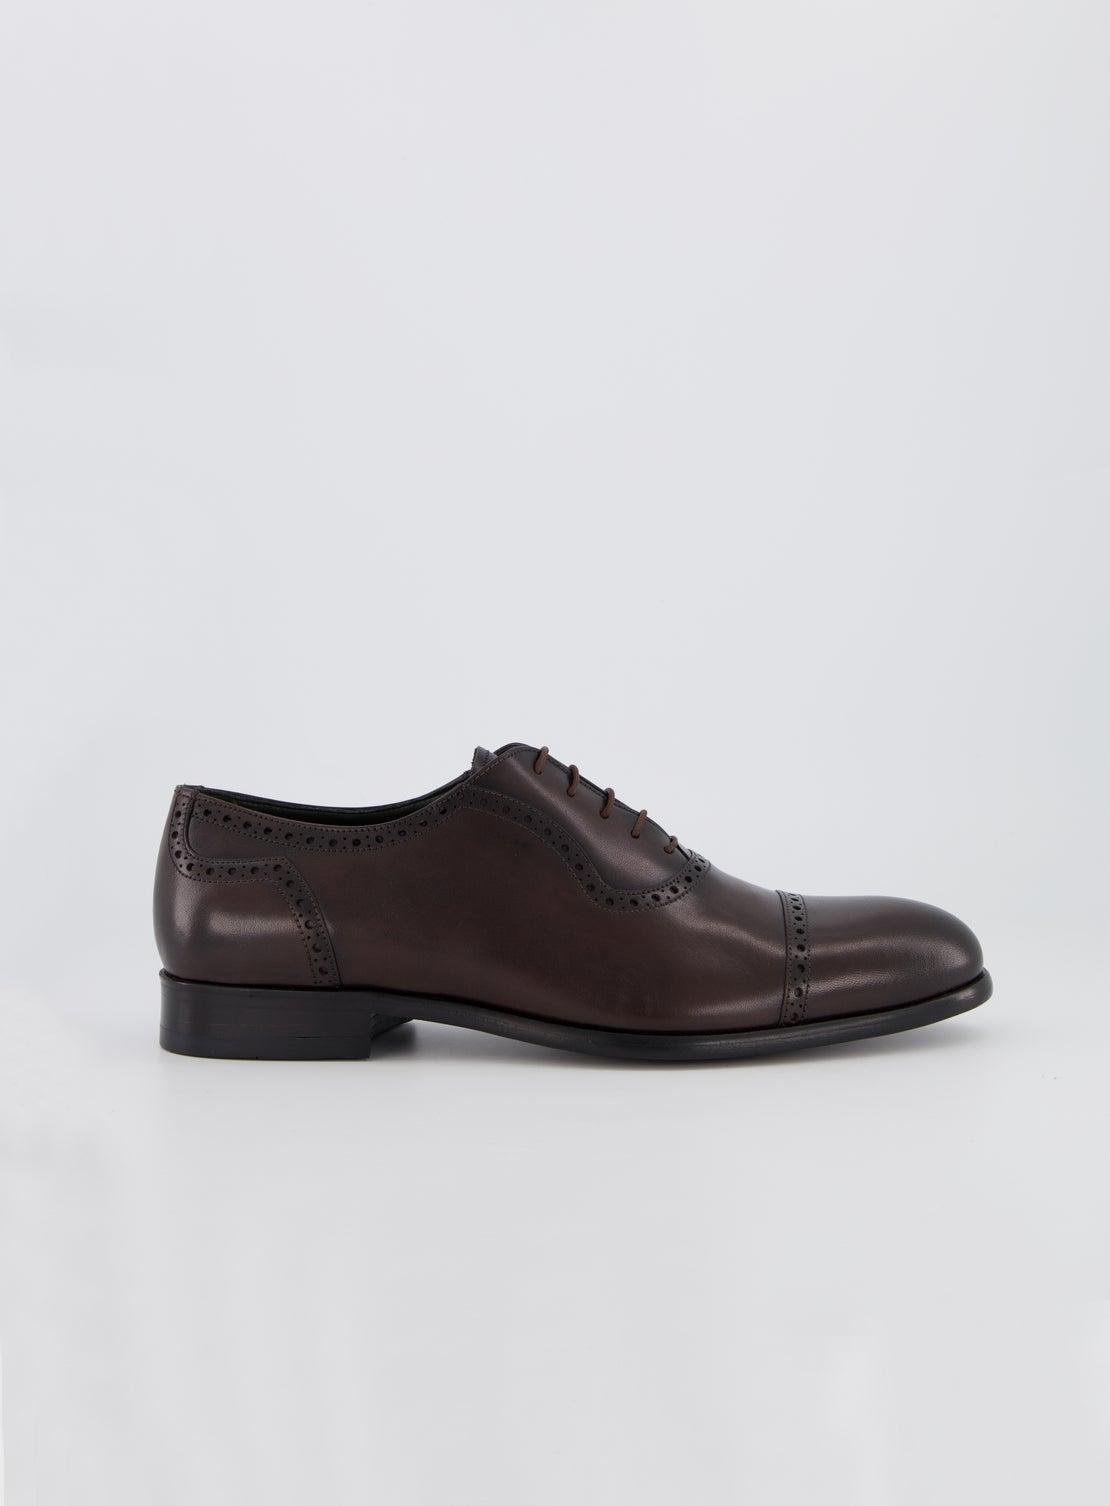 DM Chocolate Brogue Shoe